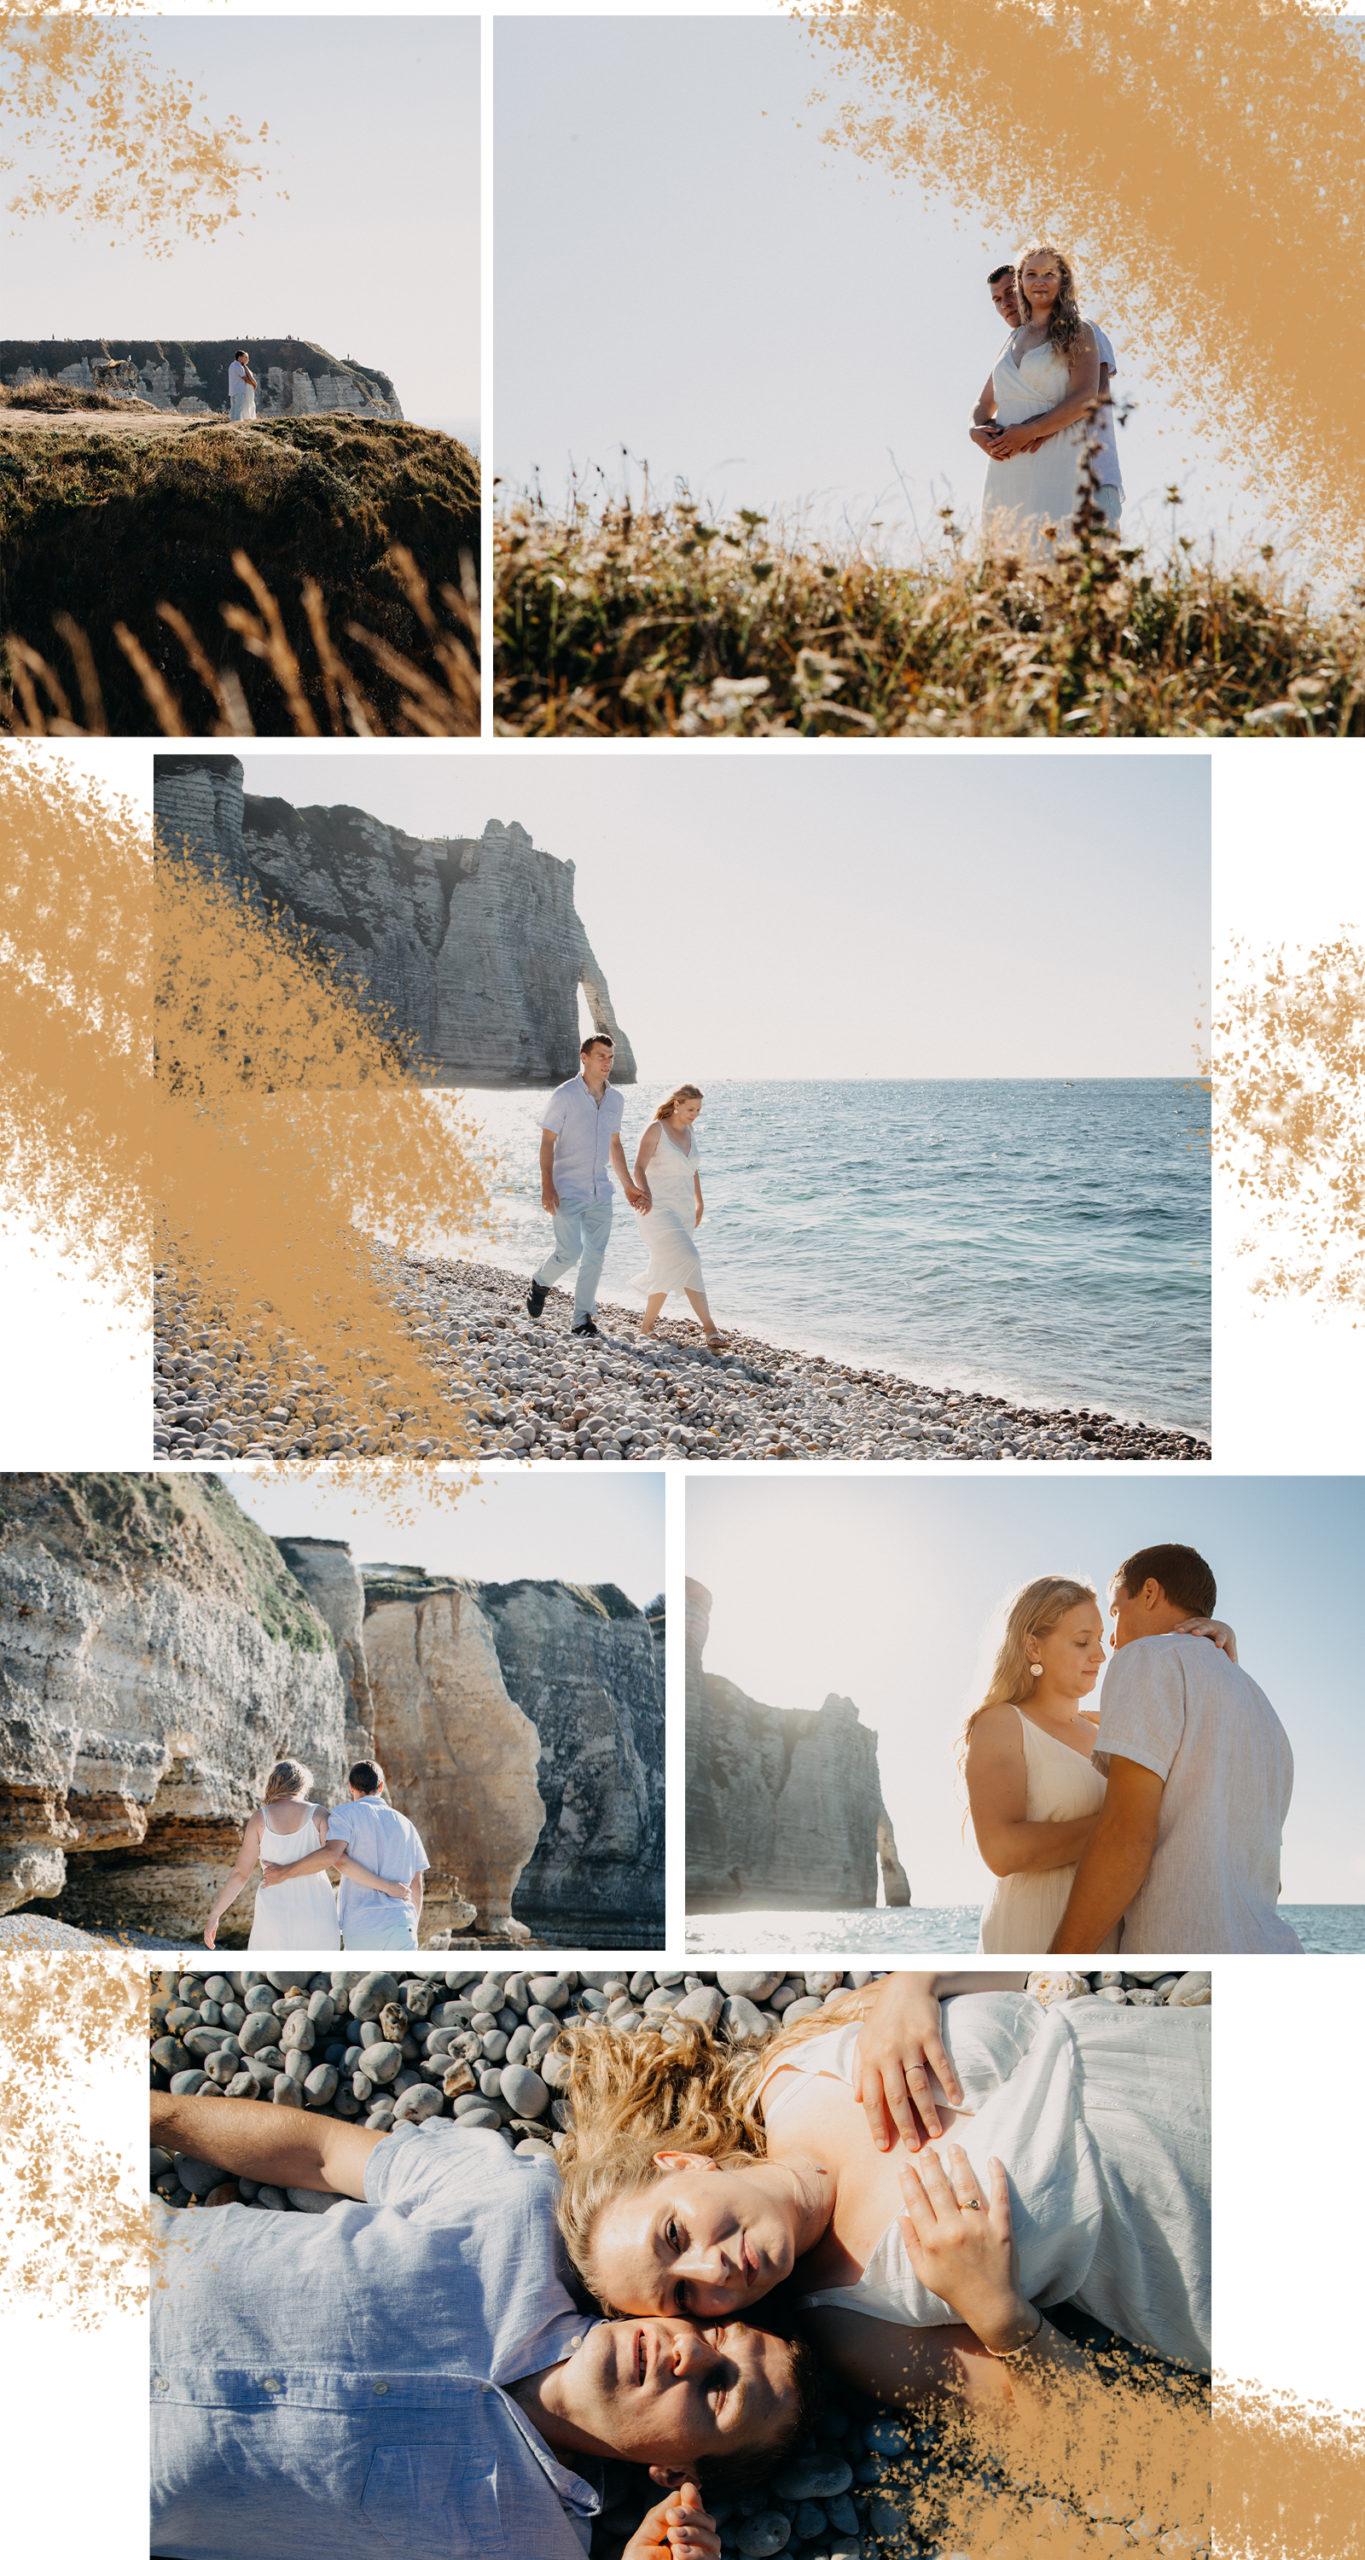 reportage photo mariage julie lebailly photographe et videaste en Normandie